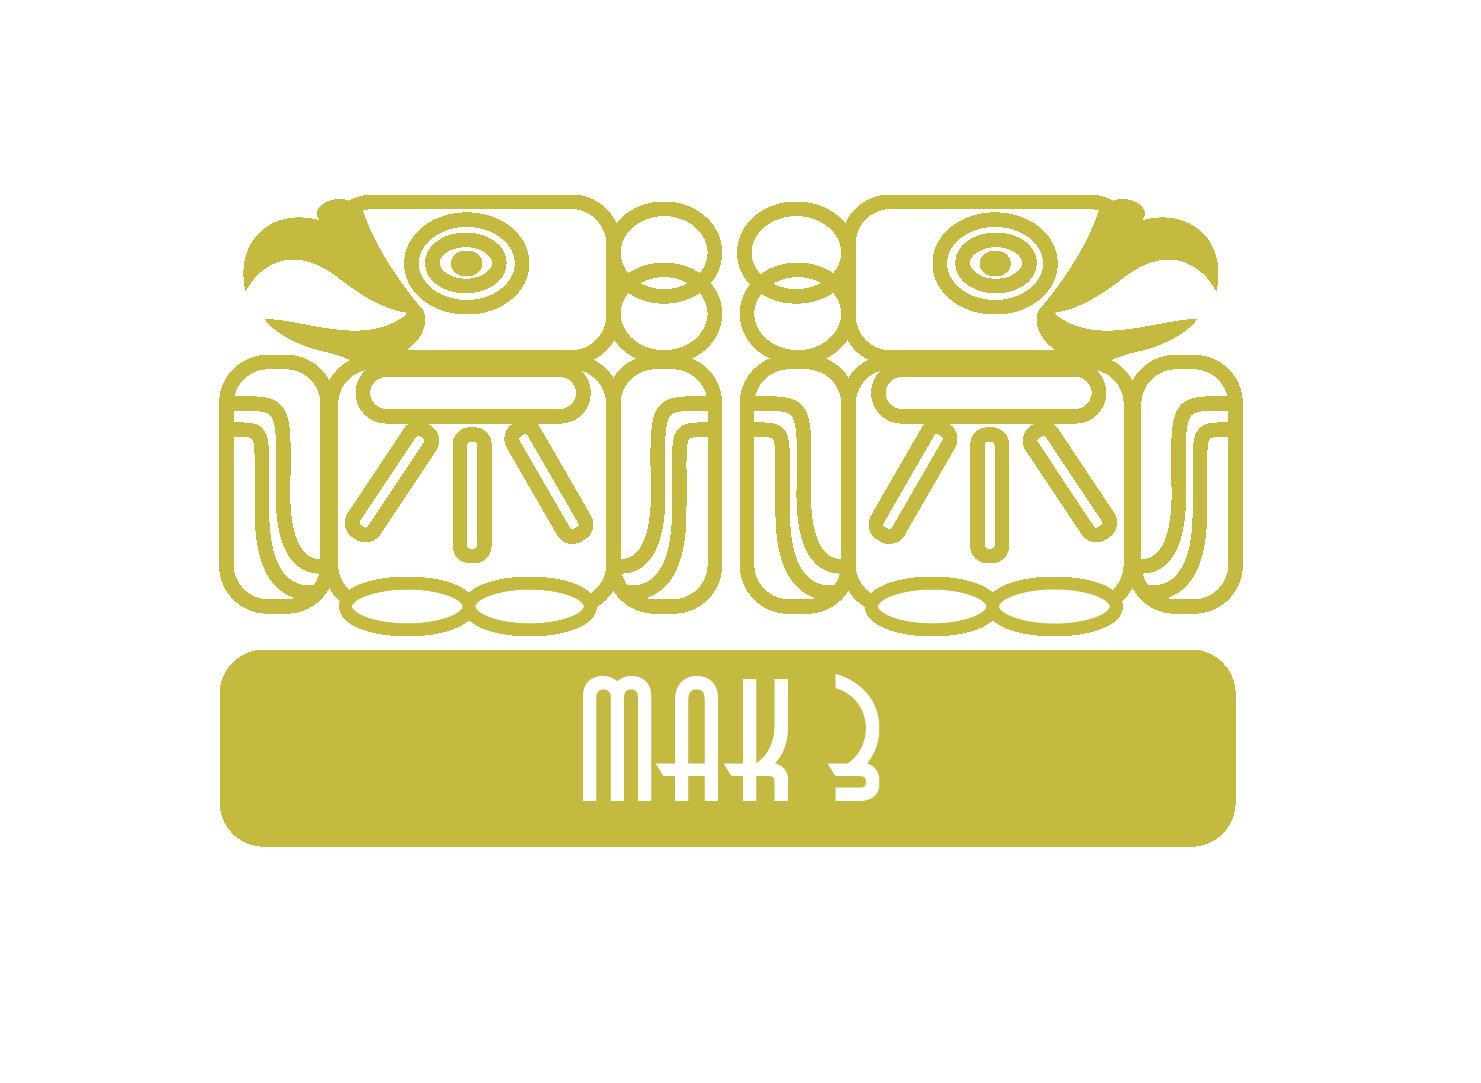 mak 3 logo